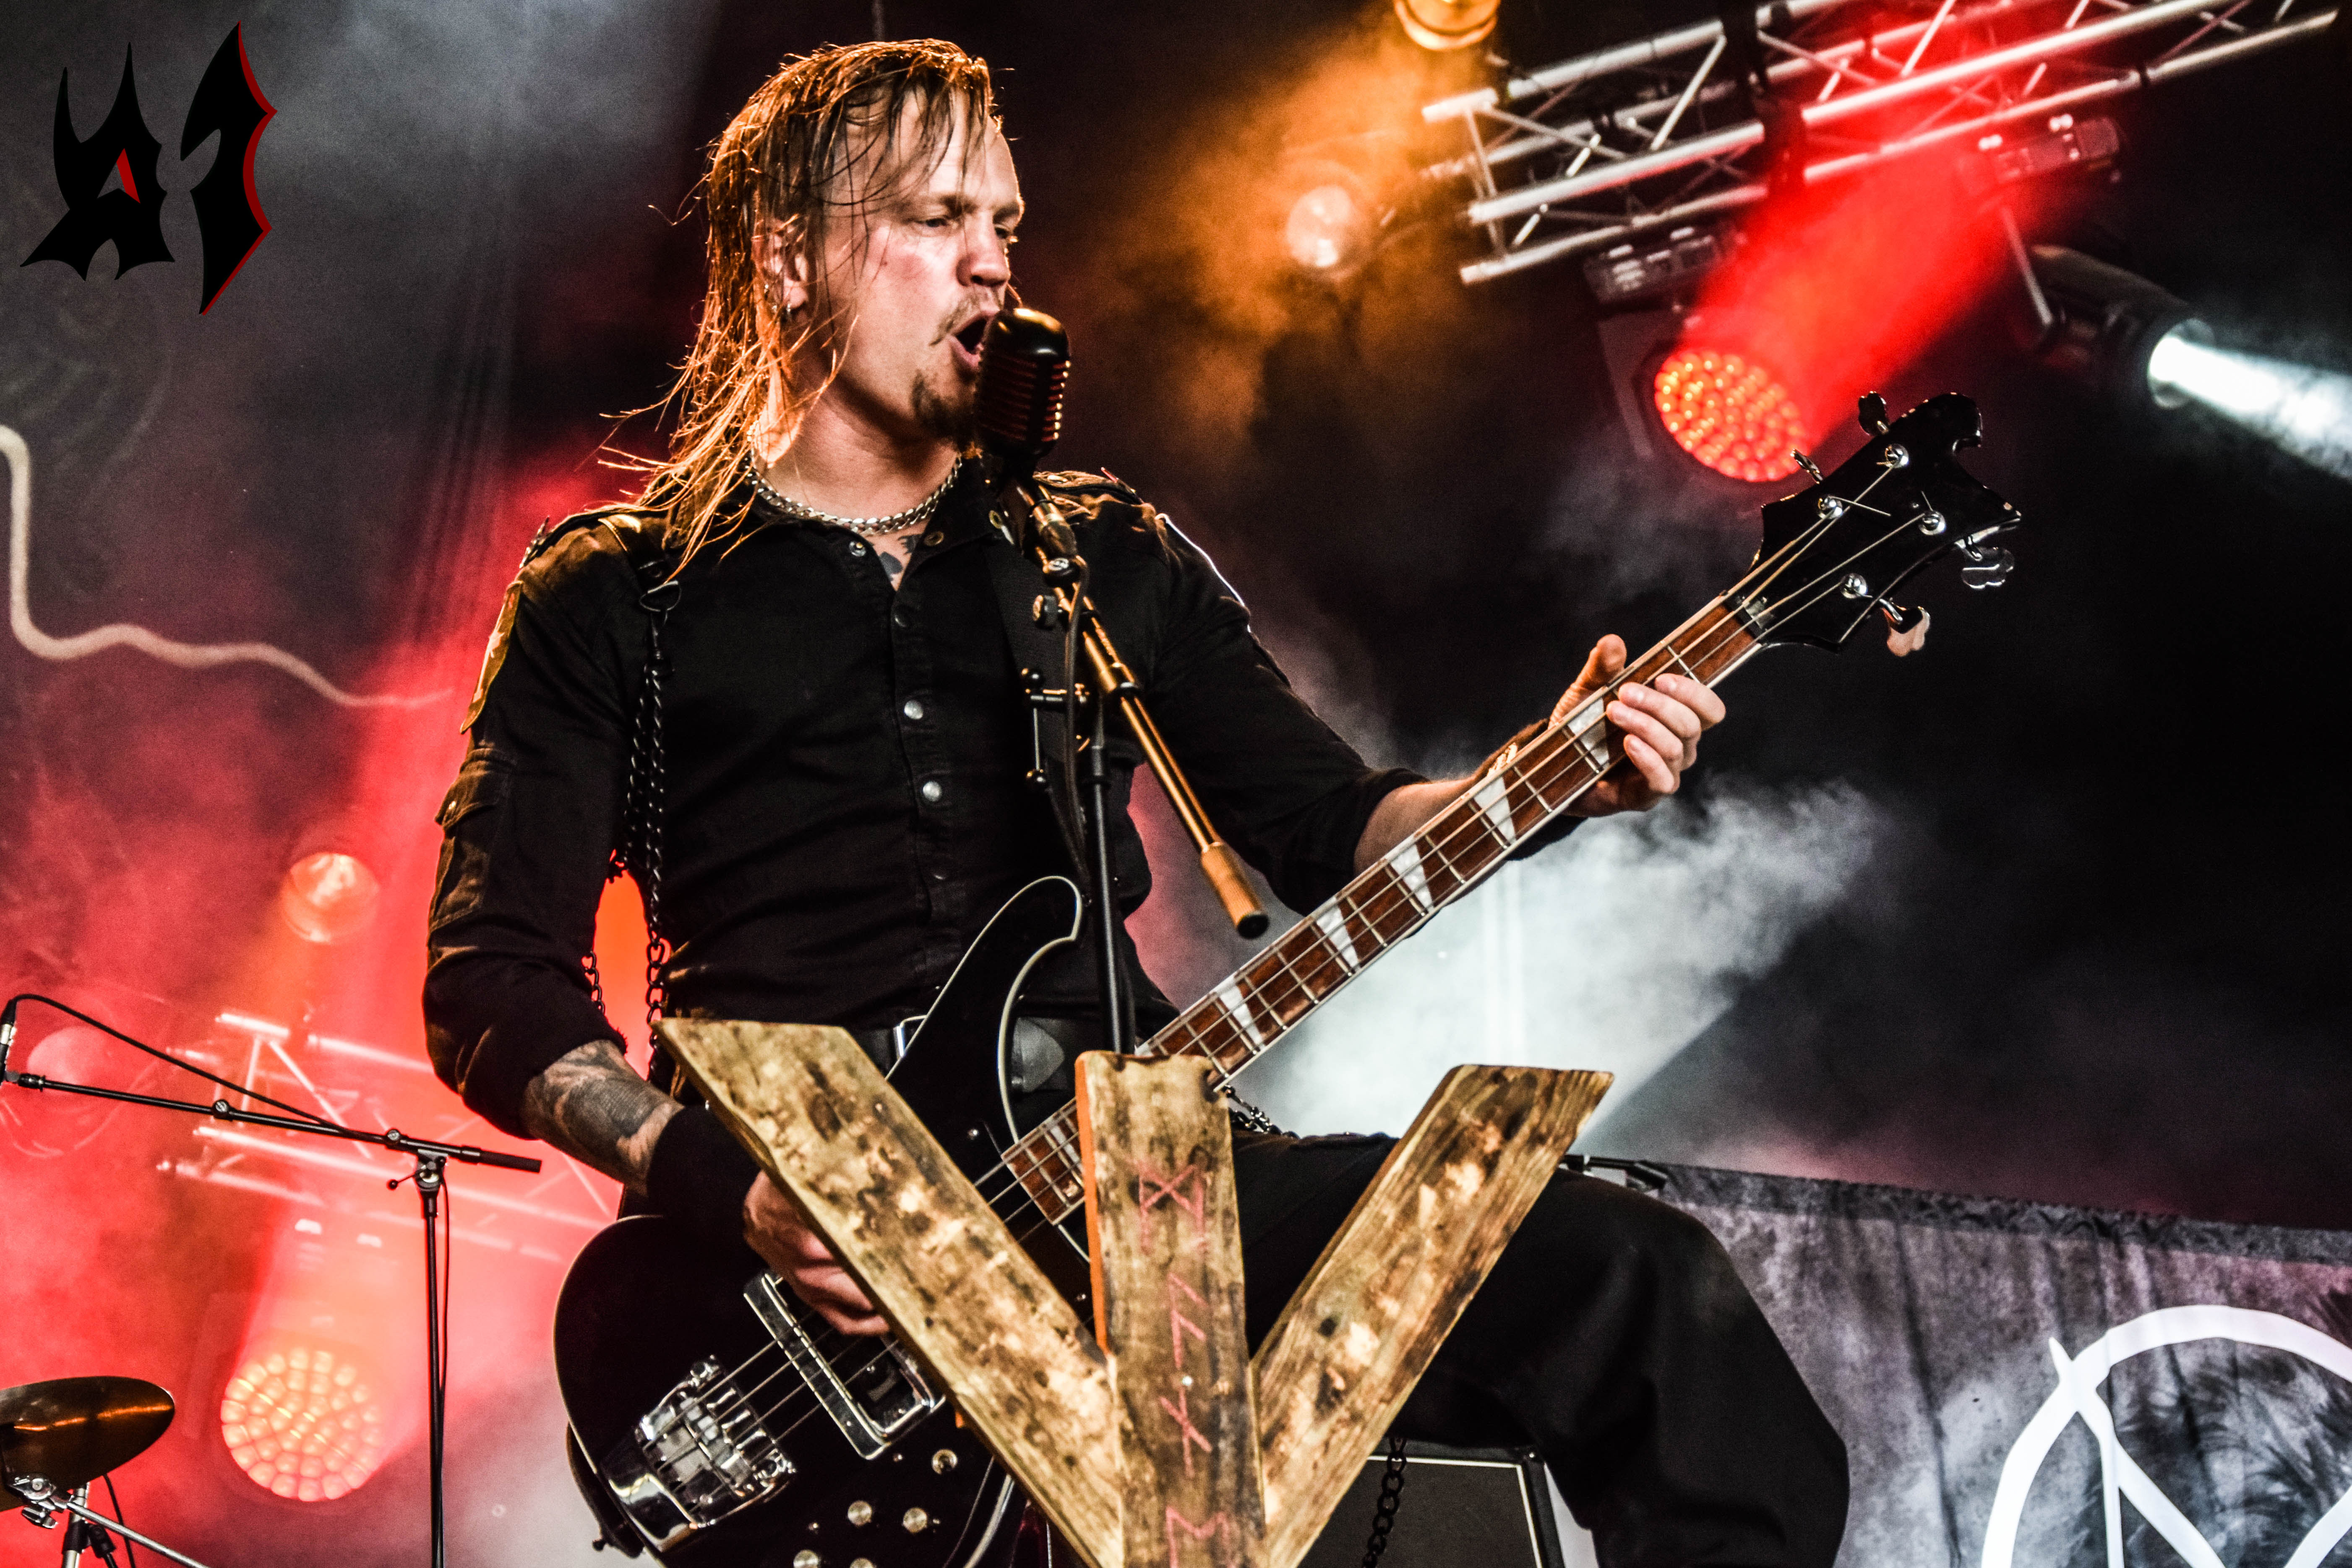 Hellfest 2018 – Day 3 - Manegarm 17